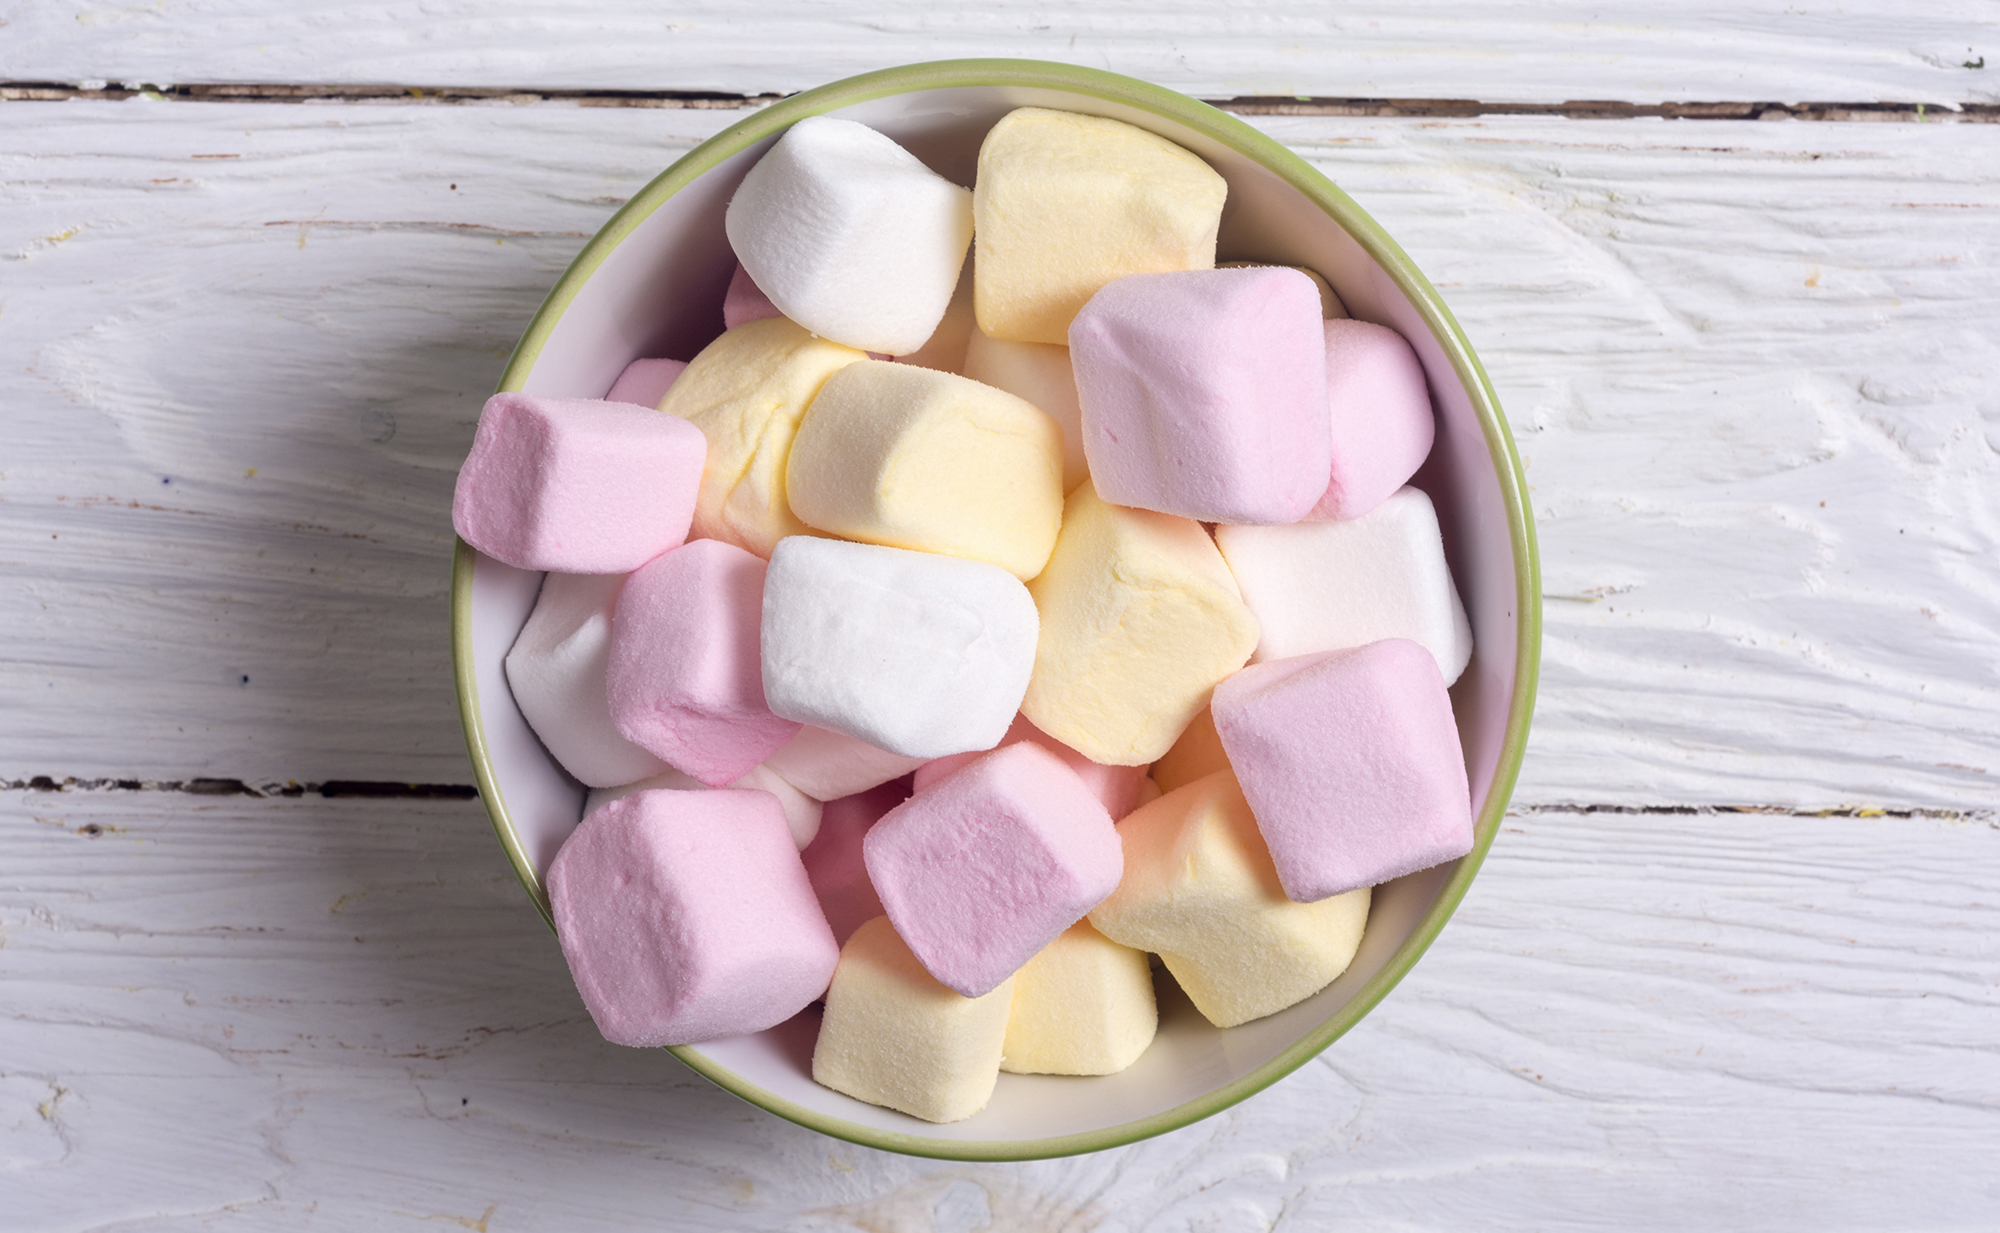 Marshmallow Benefits